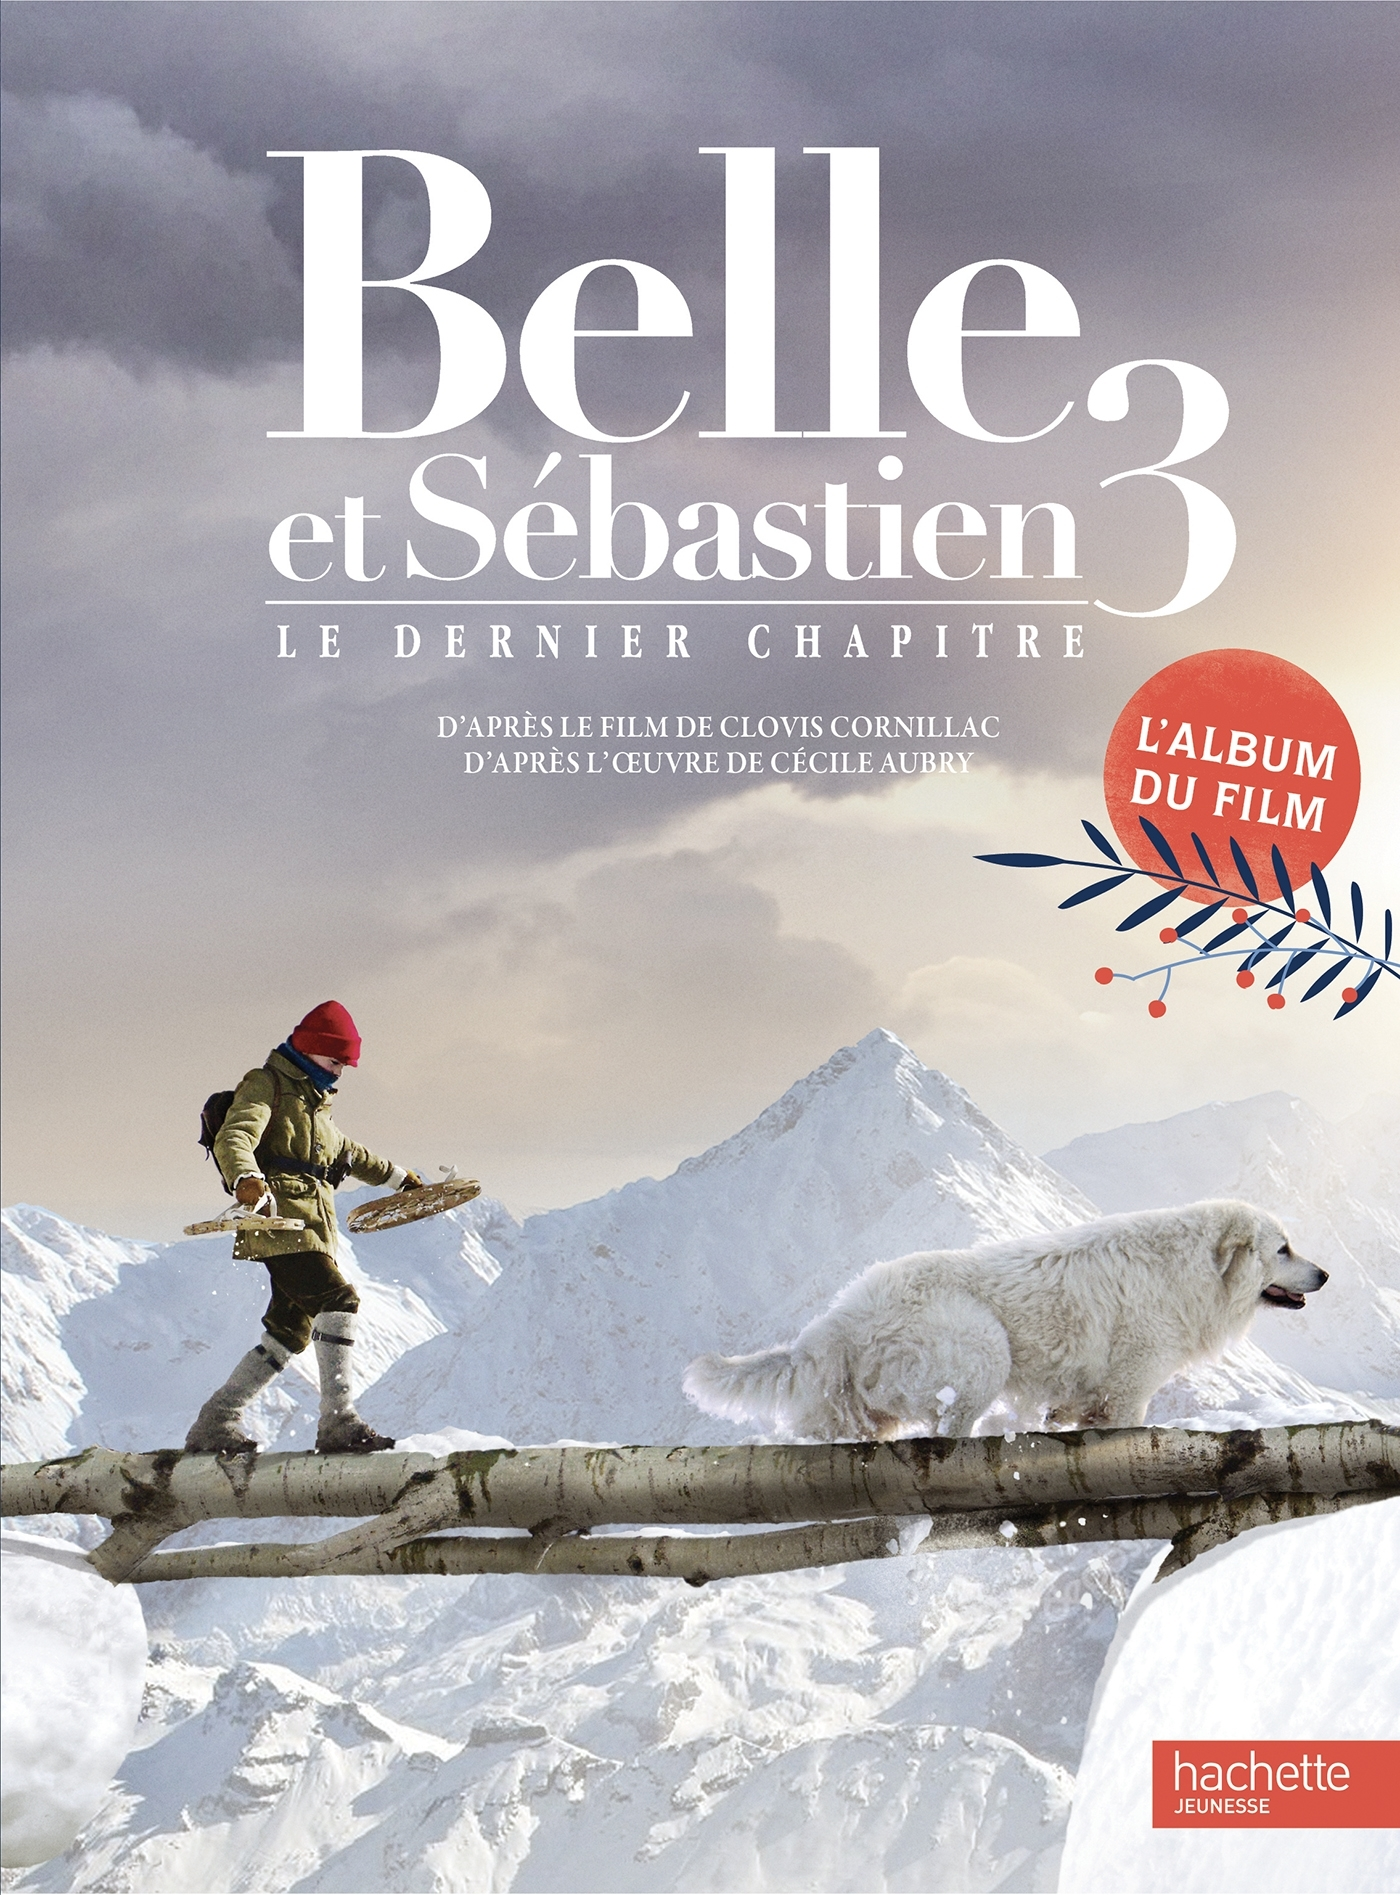 BELLE ET SEBASTIEN 3 - ALBUM DU FILM